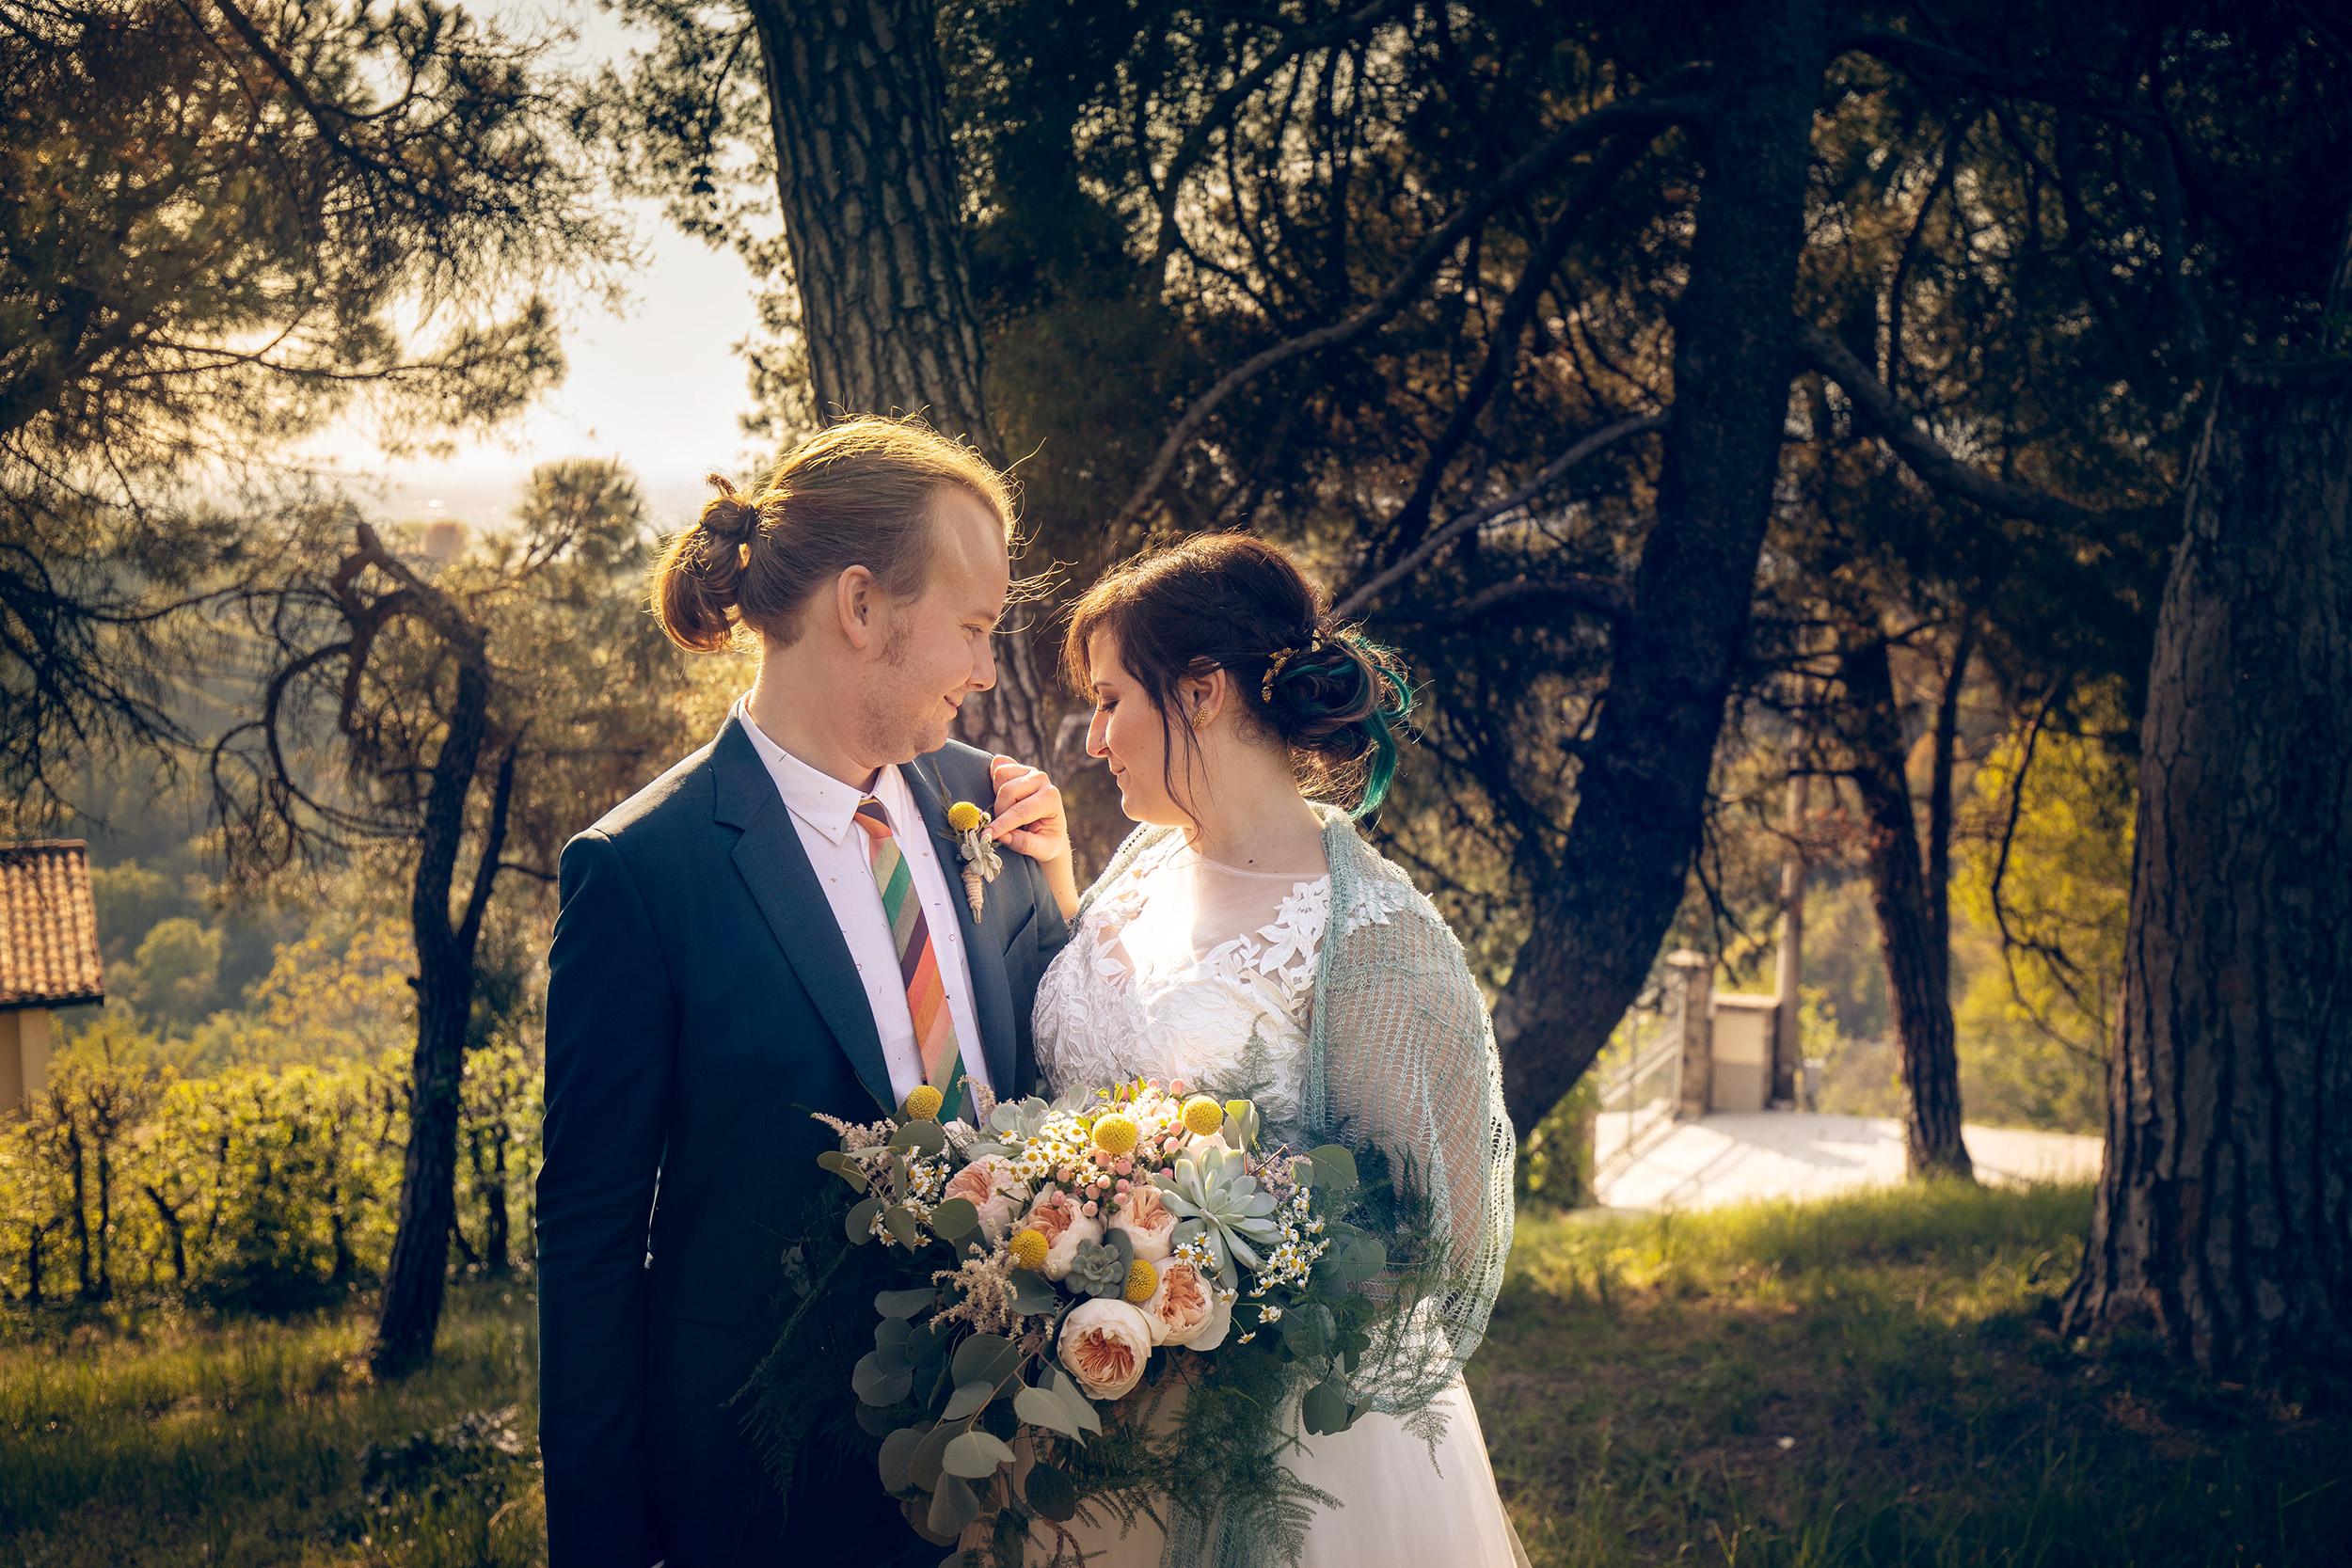 000 sposi matrimonio wedding reportage tenuta frizzoni torre de roveri bergamo 1